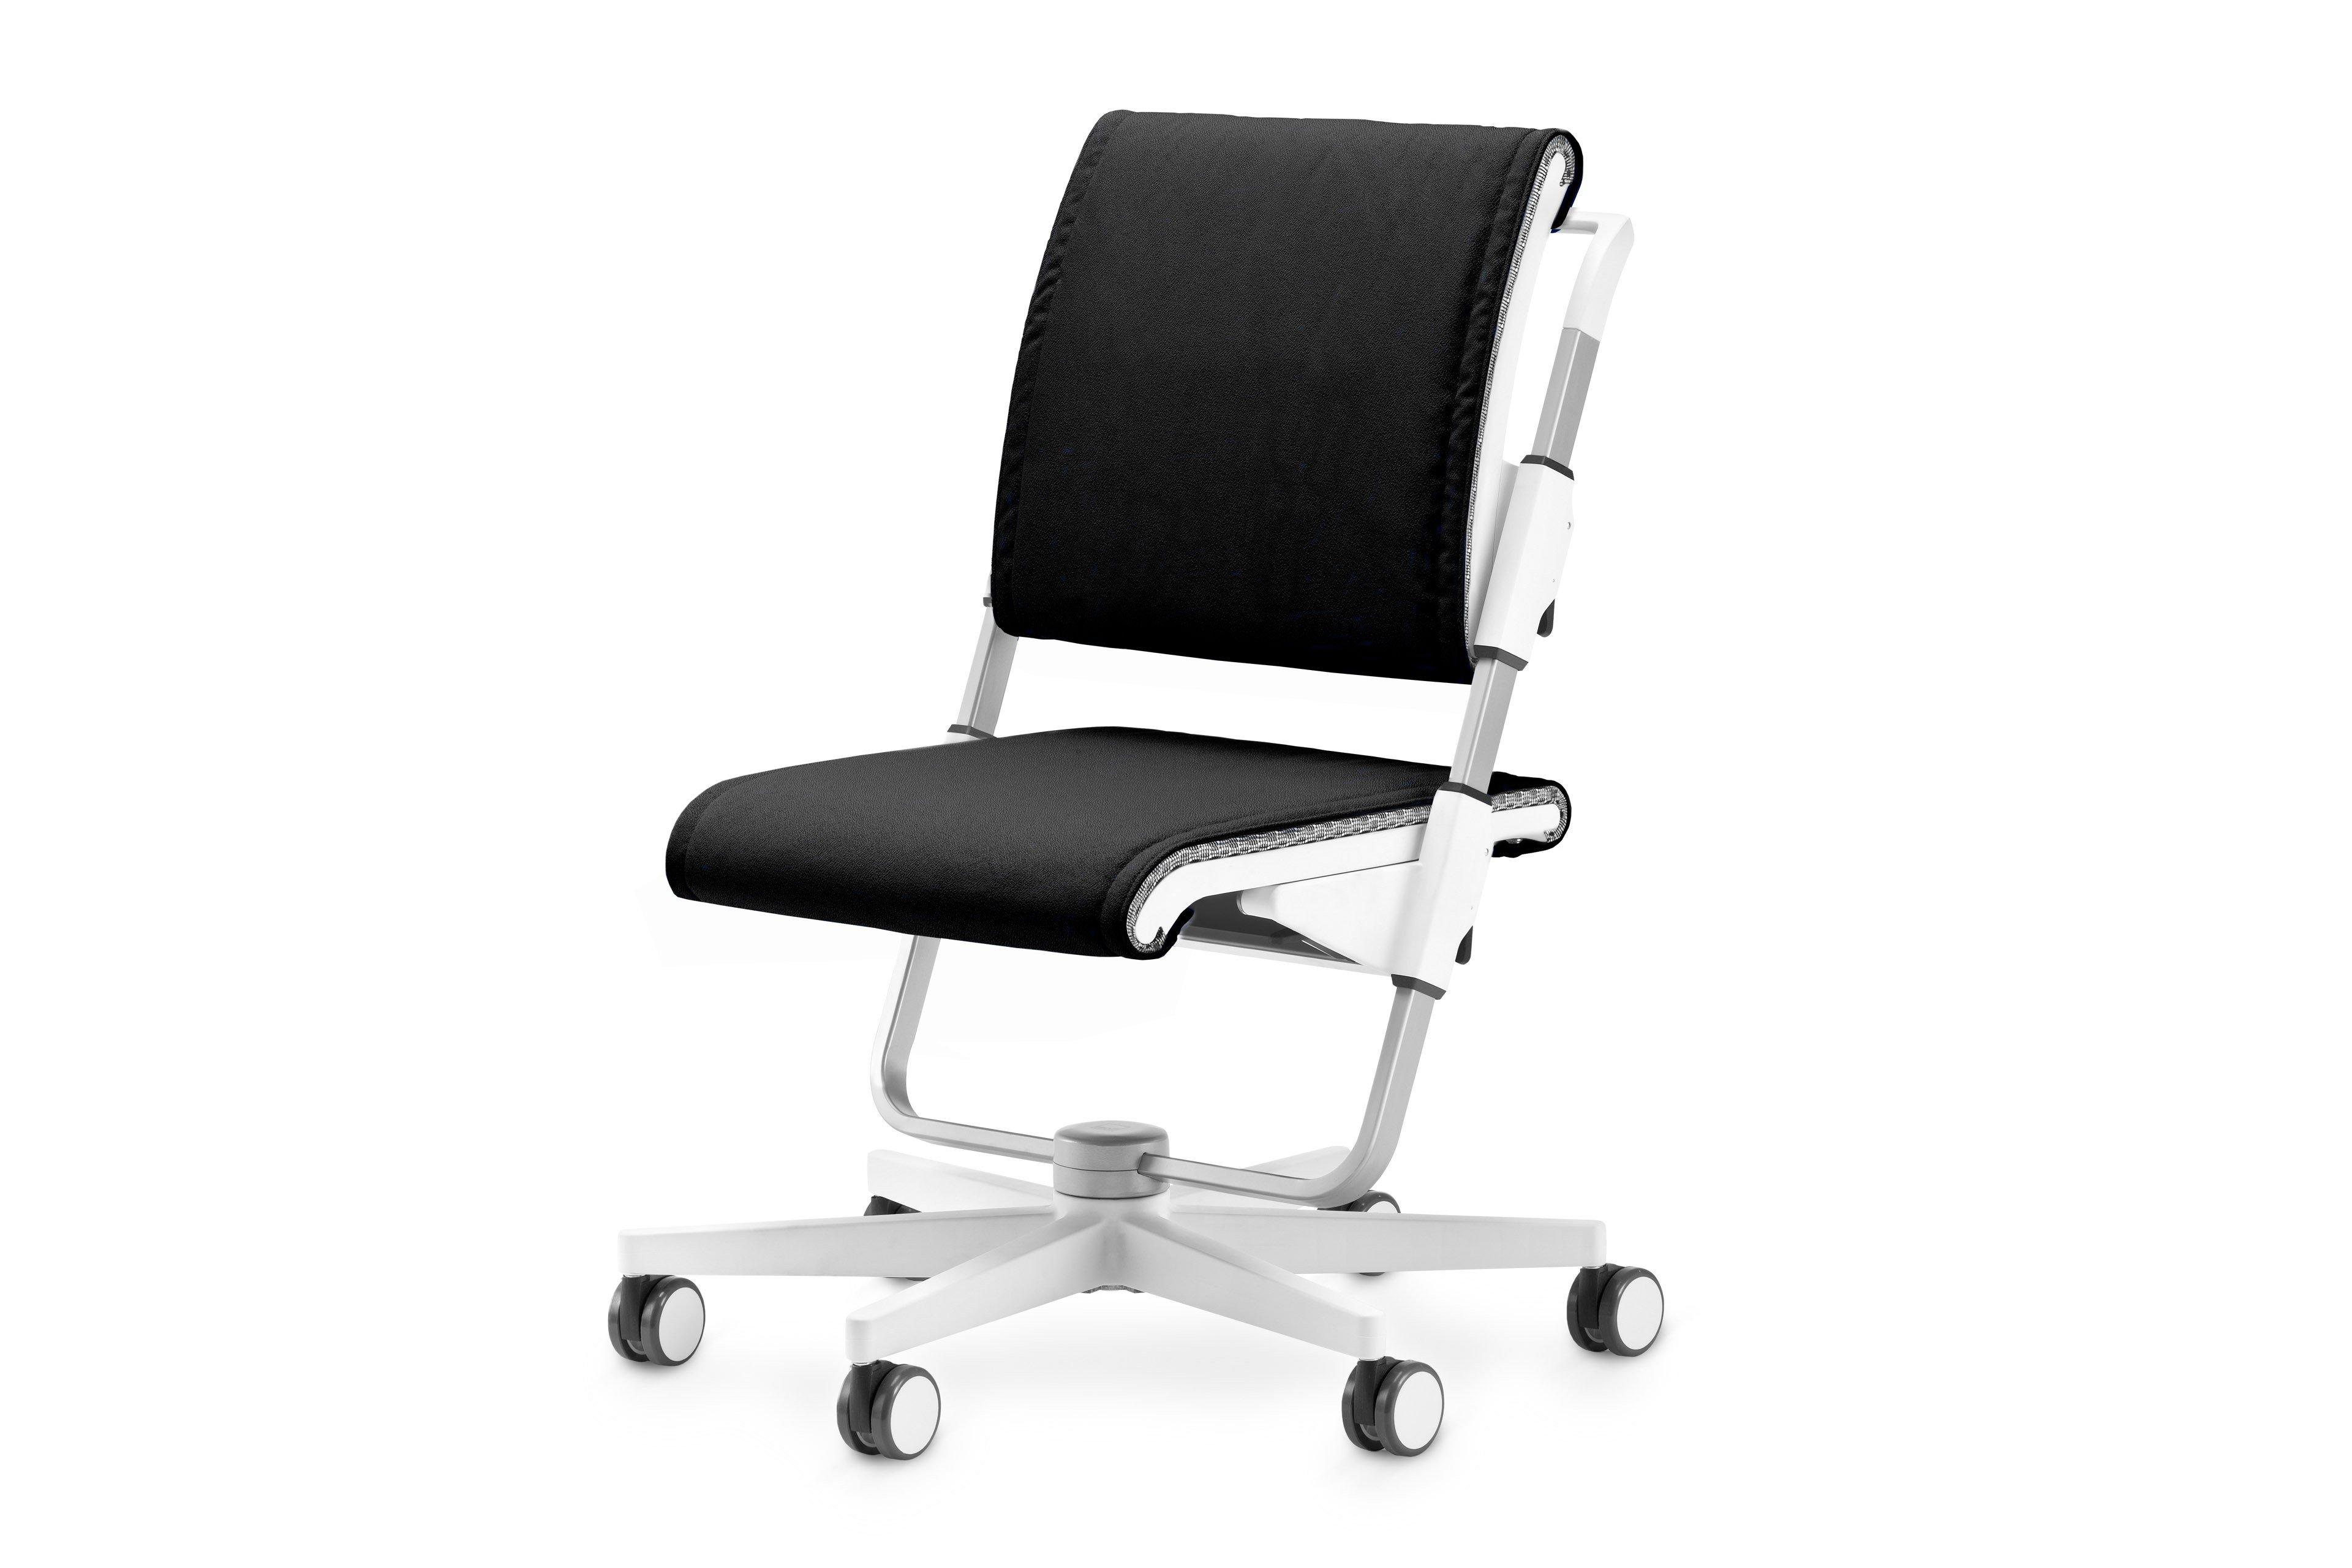 Drehstuhl weiß schwarz  Scooter moll Kinder-Drehstuhl weiß schwarz | Möbel Letz - Ihr ...